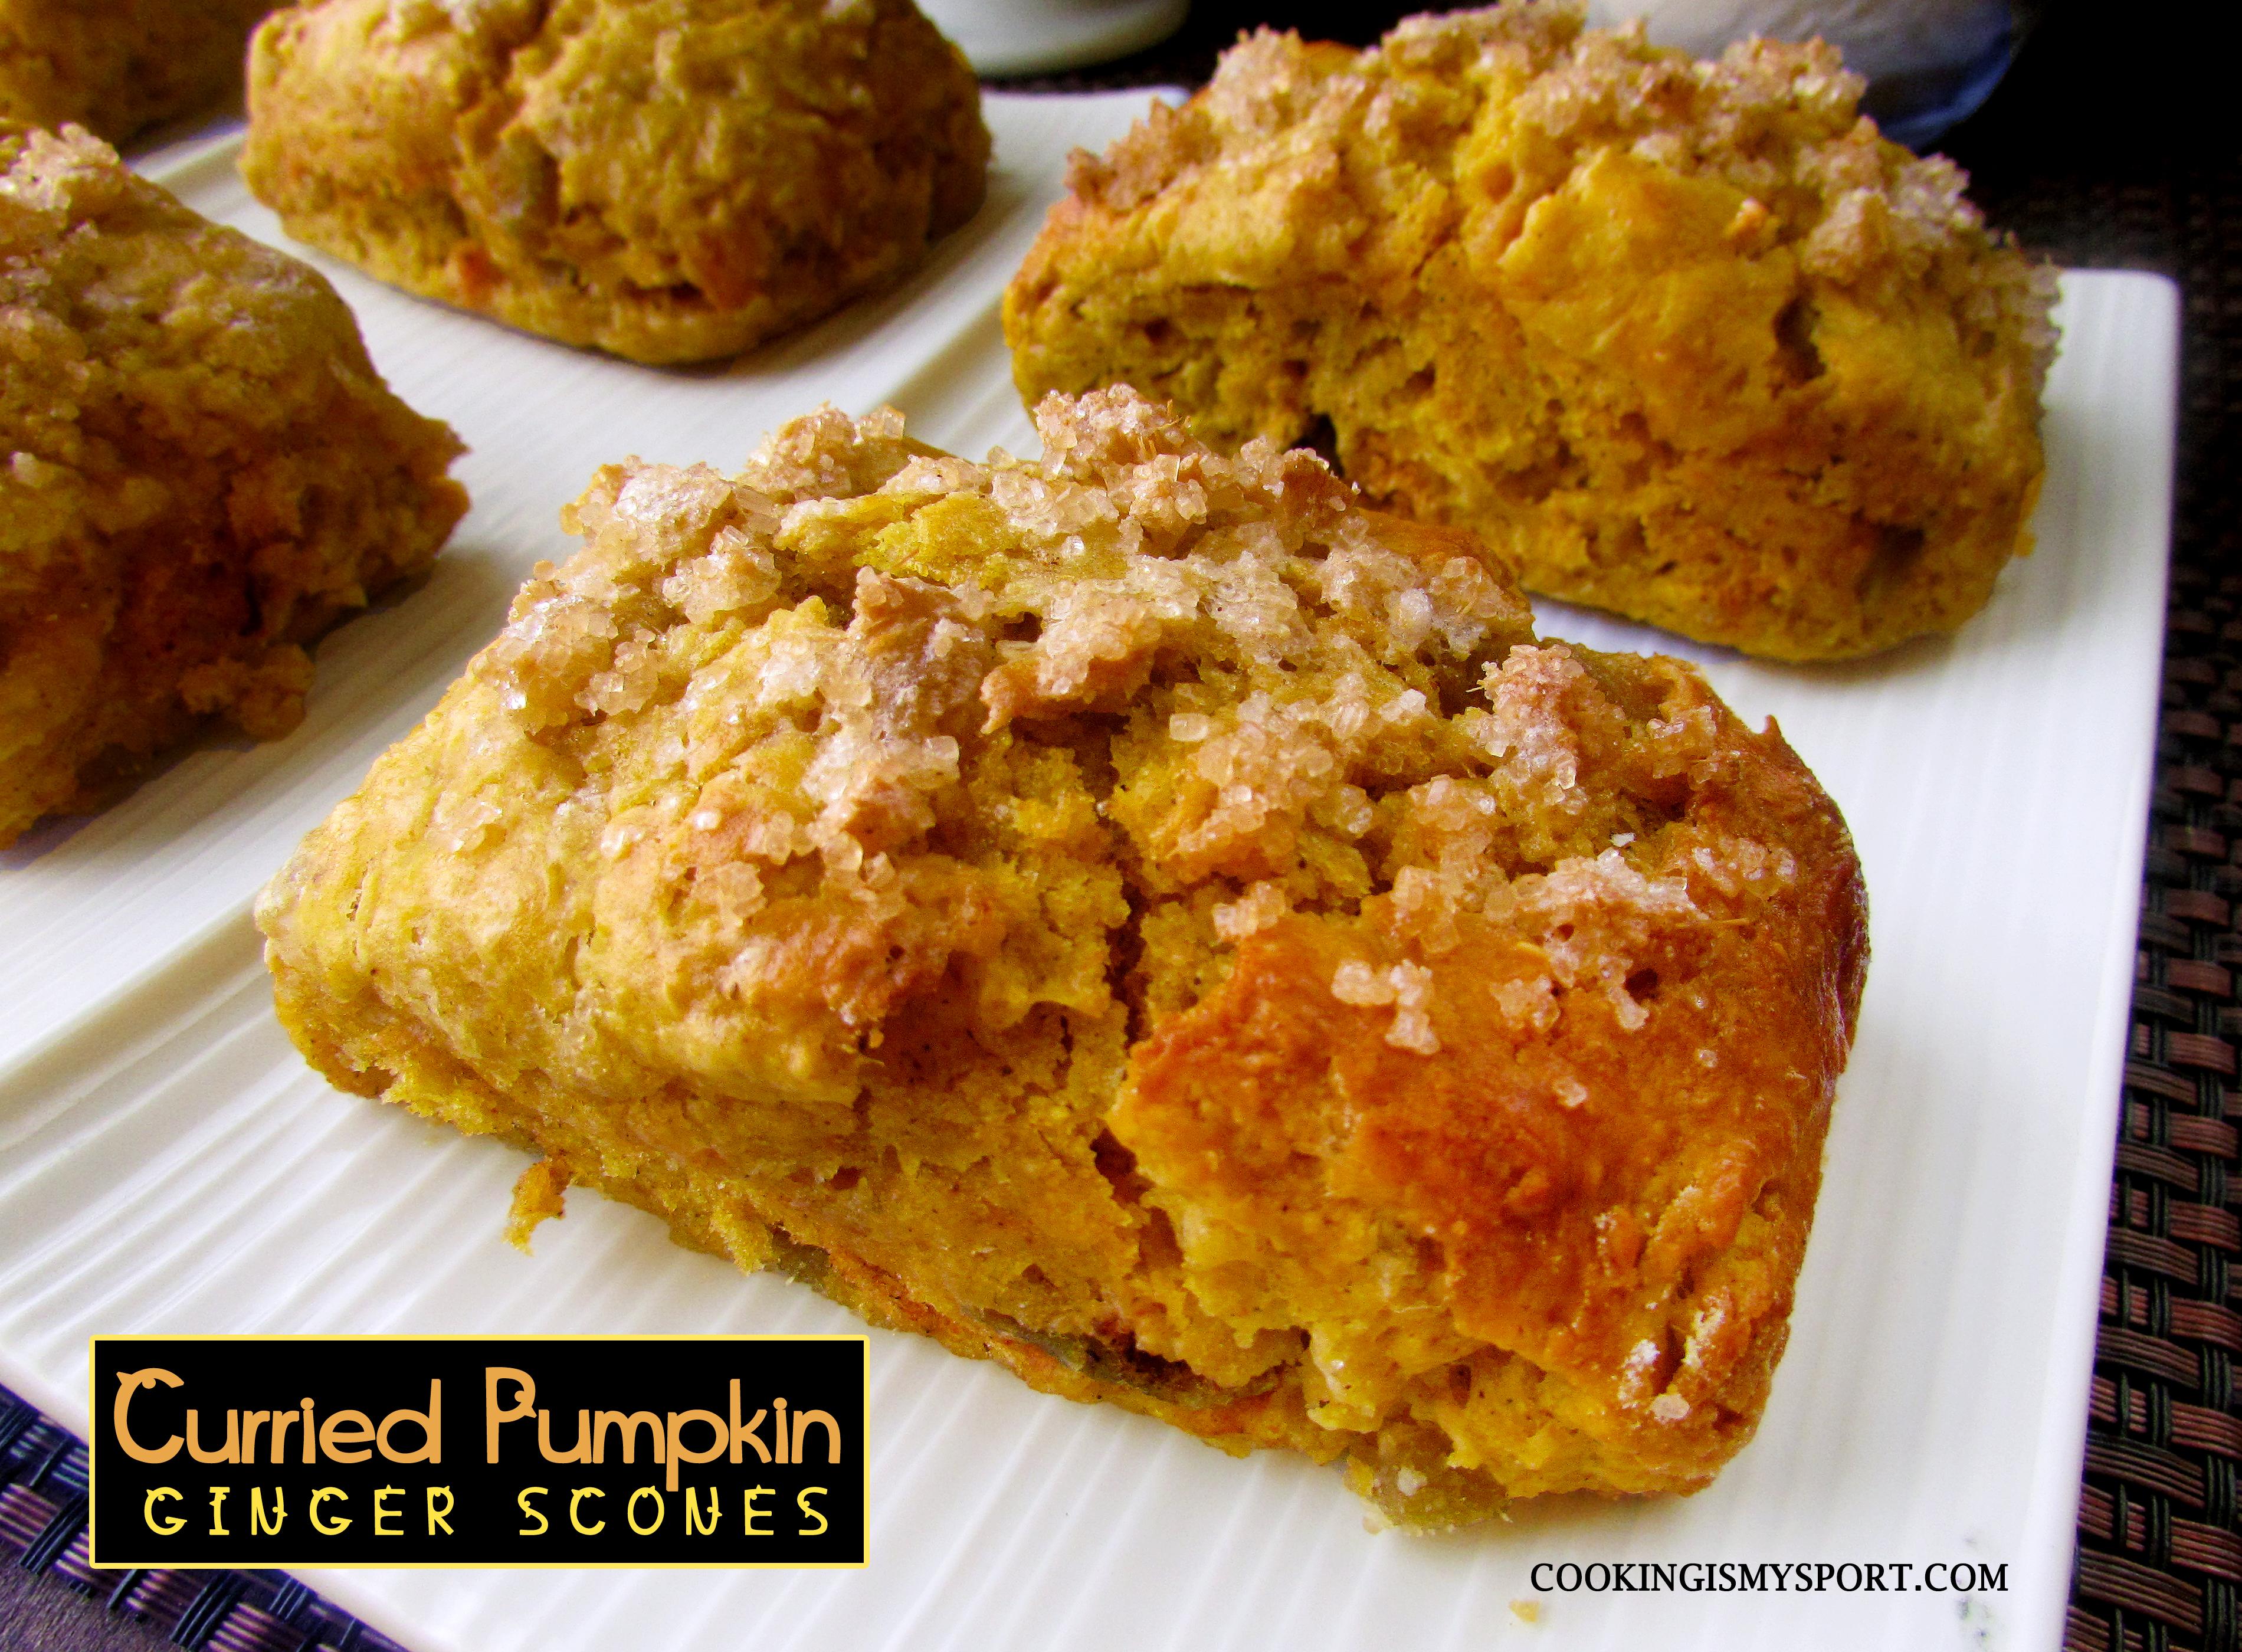 curried-pumpkin-ginger-scones1